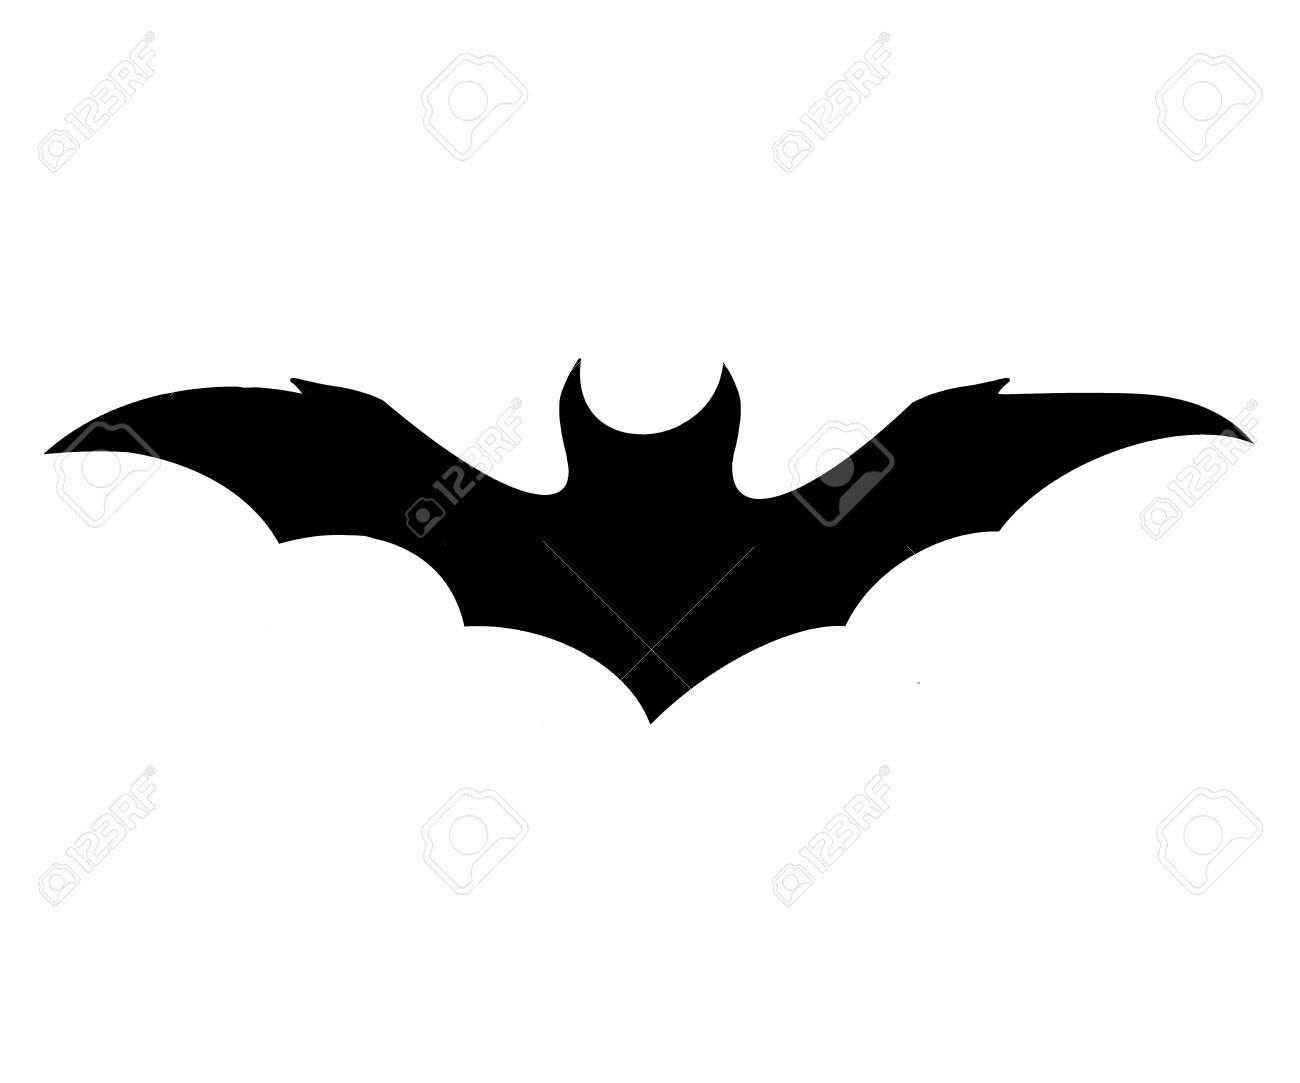 black bat icon on white background, symbol of halloween - 108204675